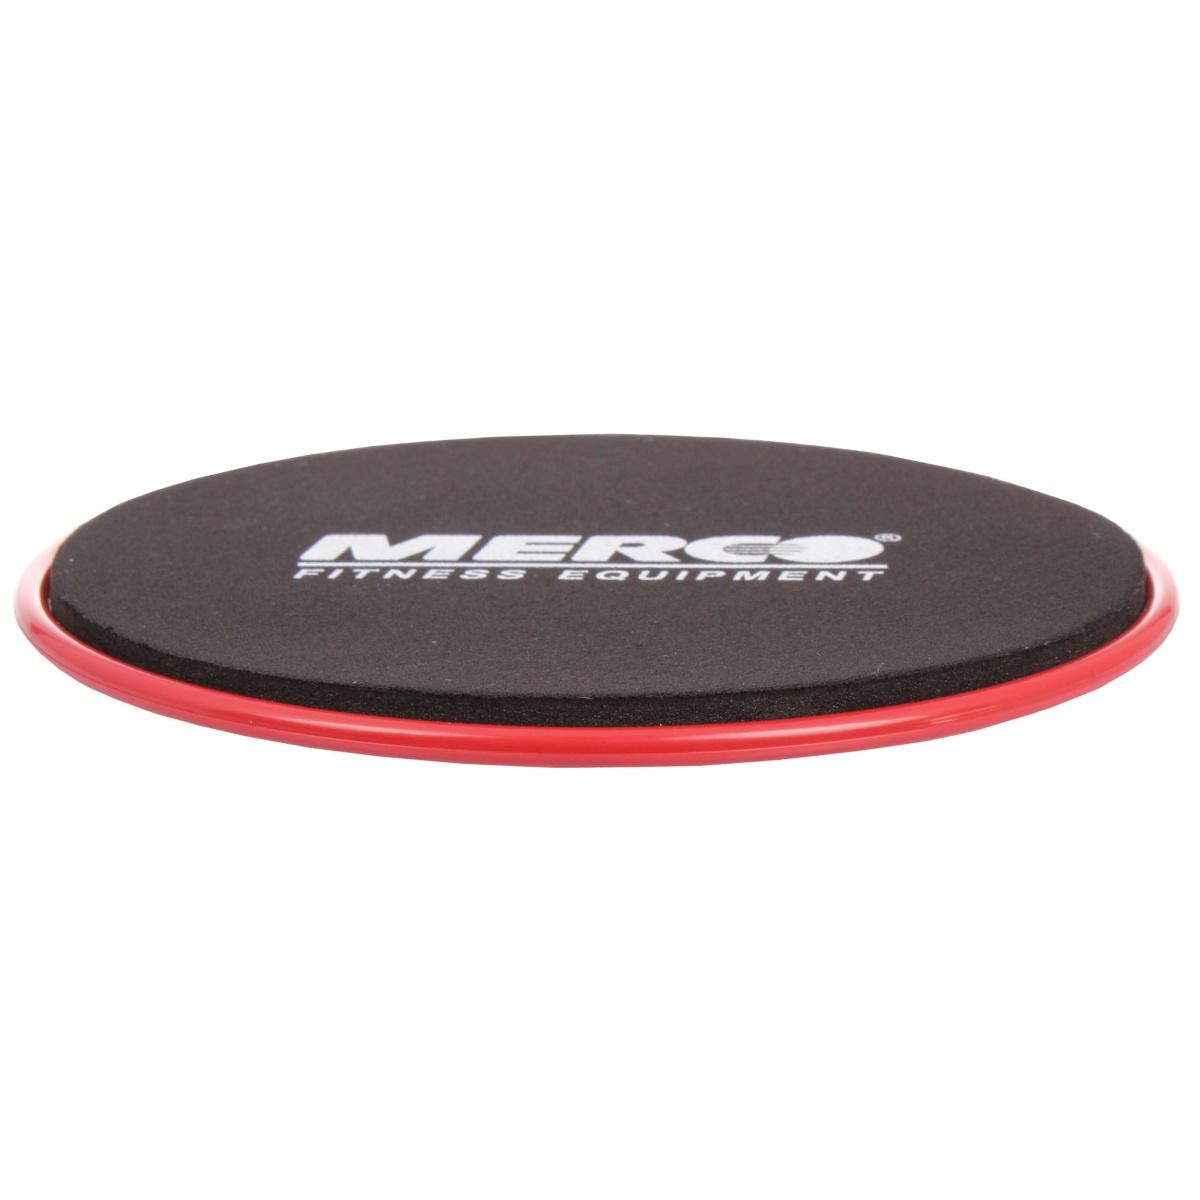 Merco Gliding Discs klouzavé disky